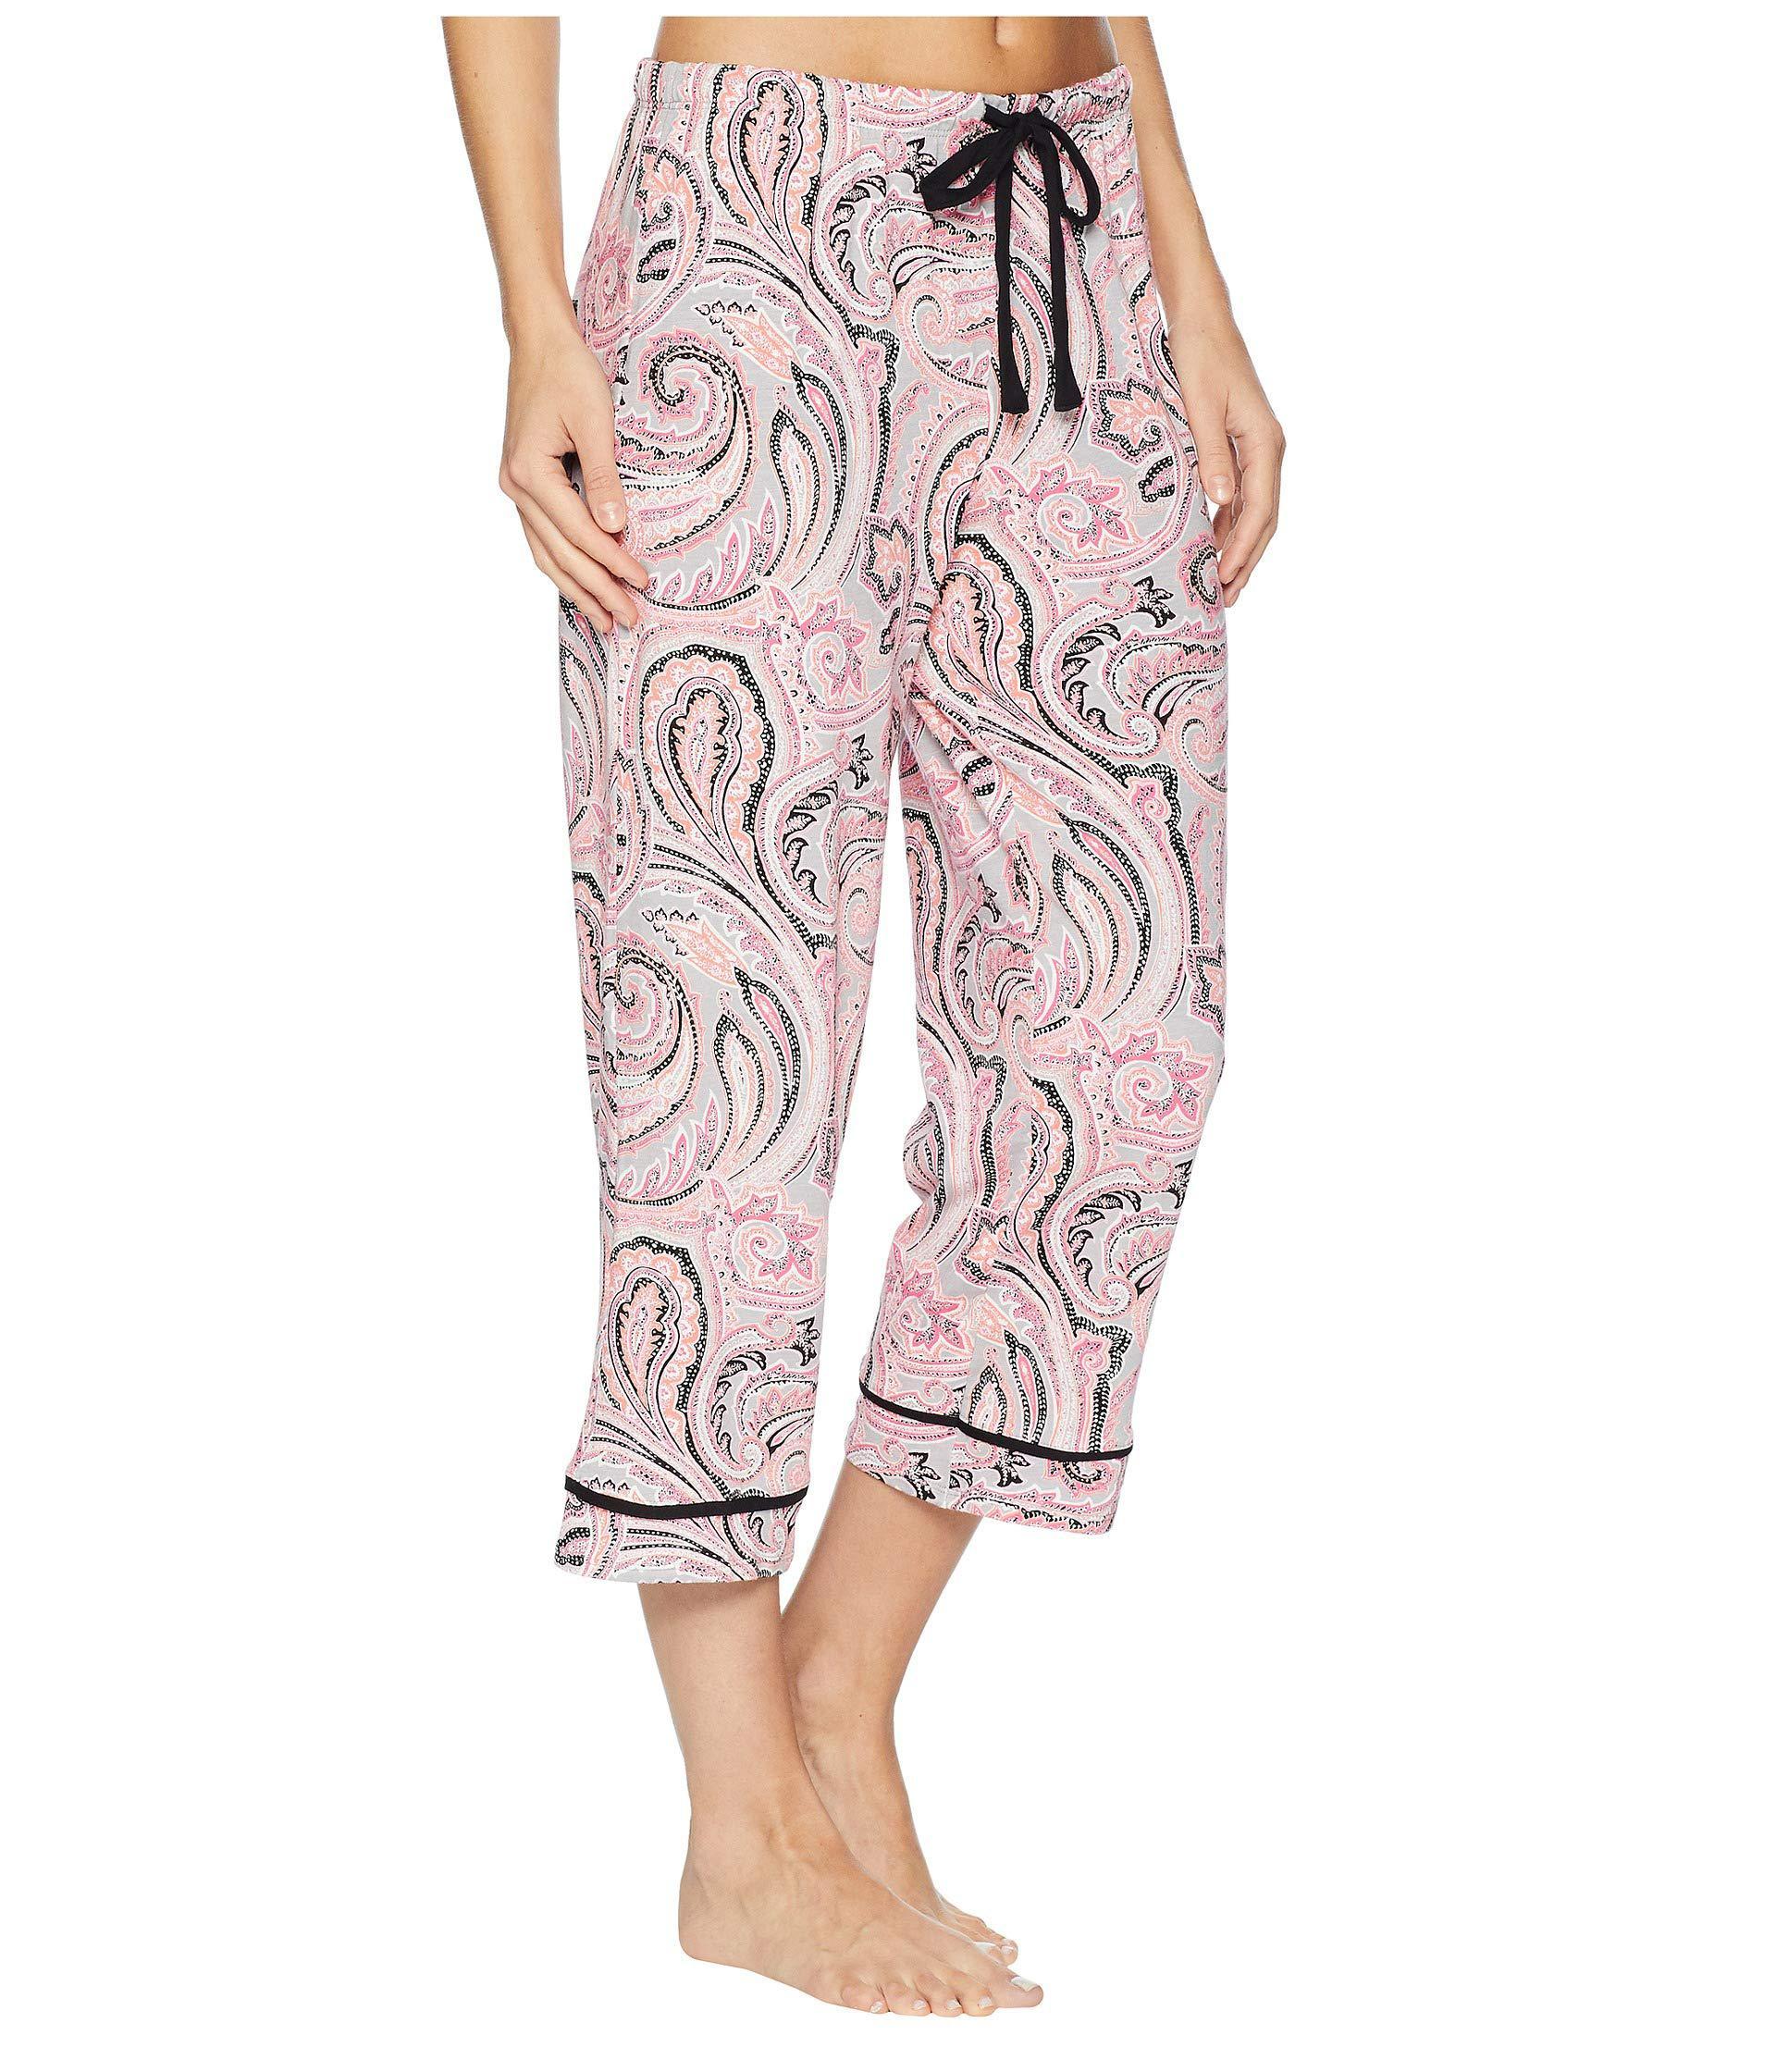 335c1097da Jockey - Pink Printed Cropped Pants (no Drama Llama) Women s Pajama - Lyst.  View fullscreen